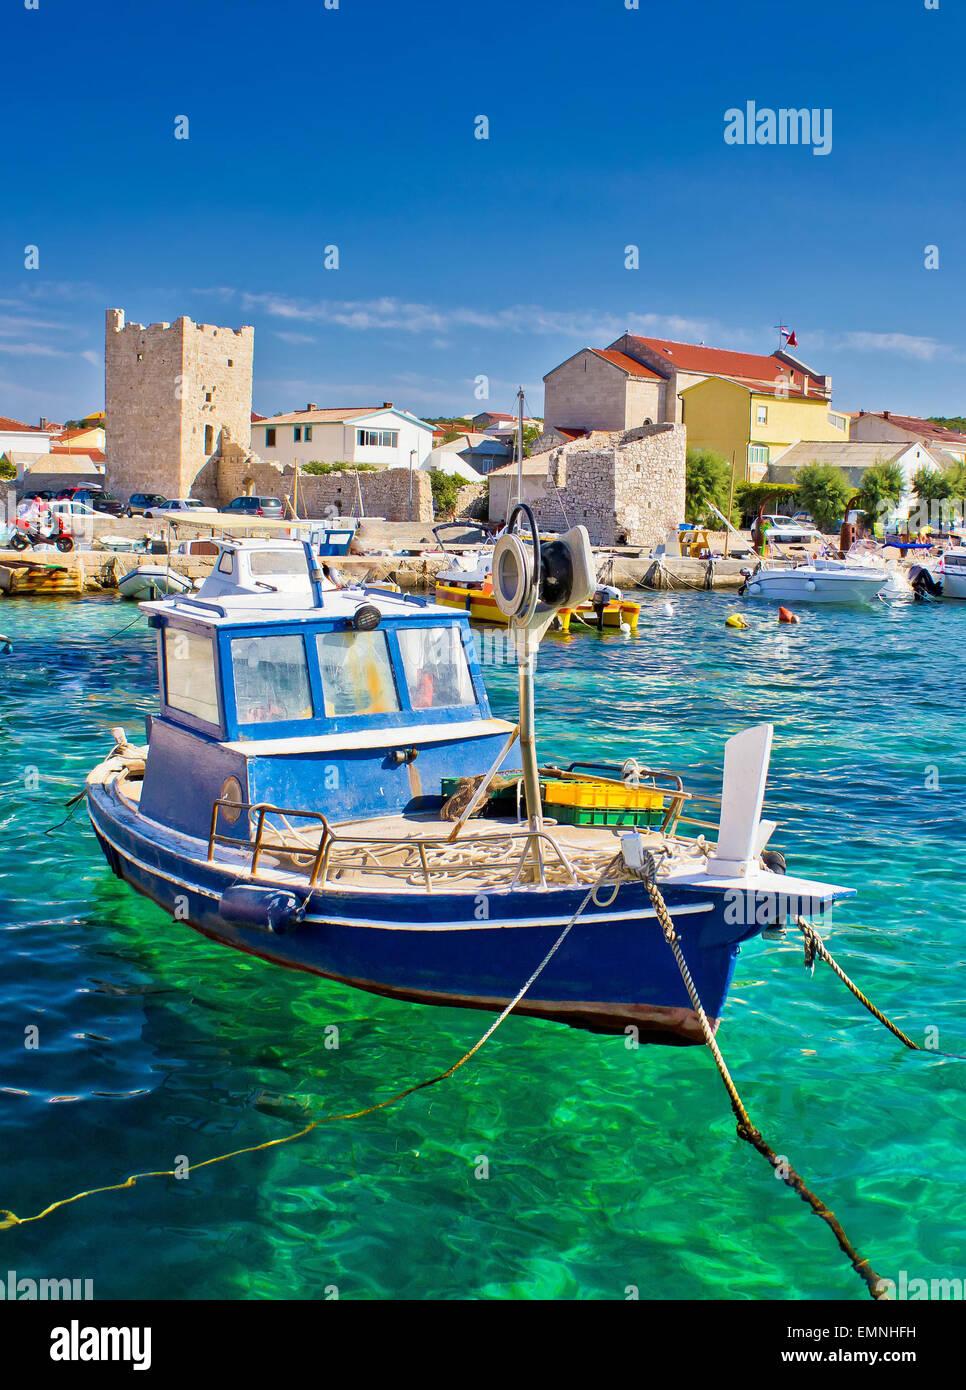 Adriatic Town of Razanac colorful waterfront, Dalmatia, Croatia - Stock Image